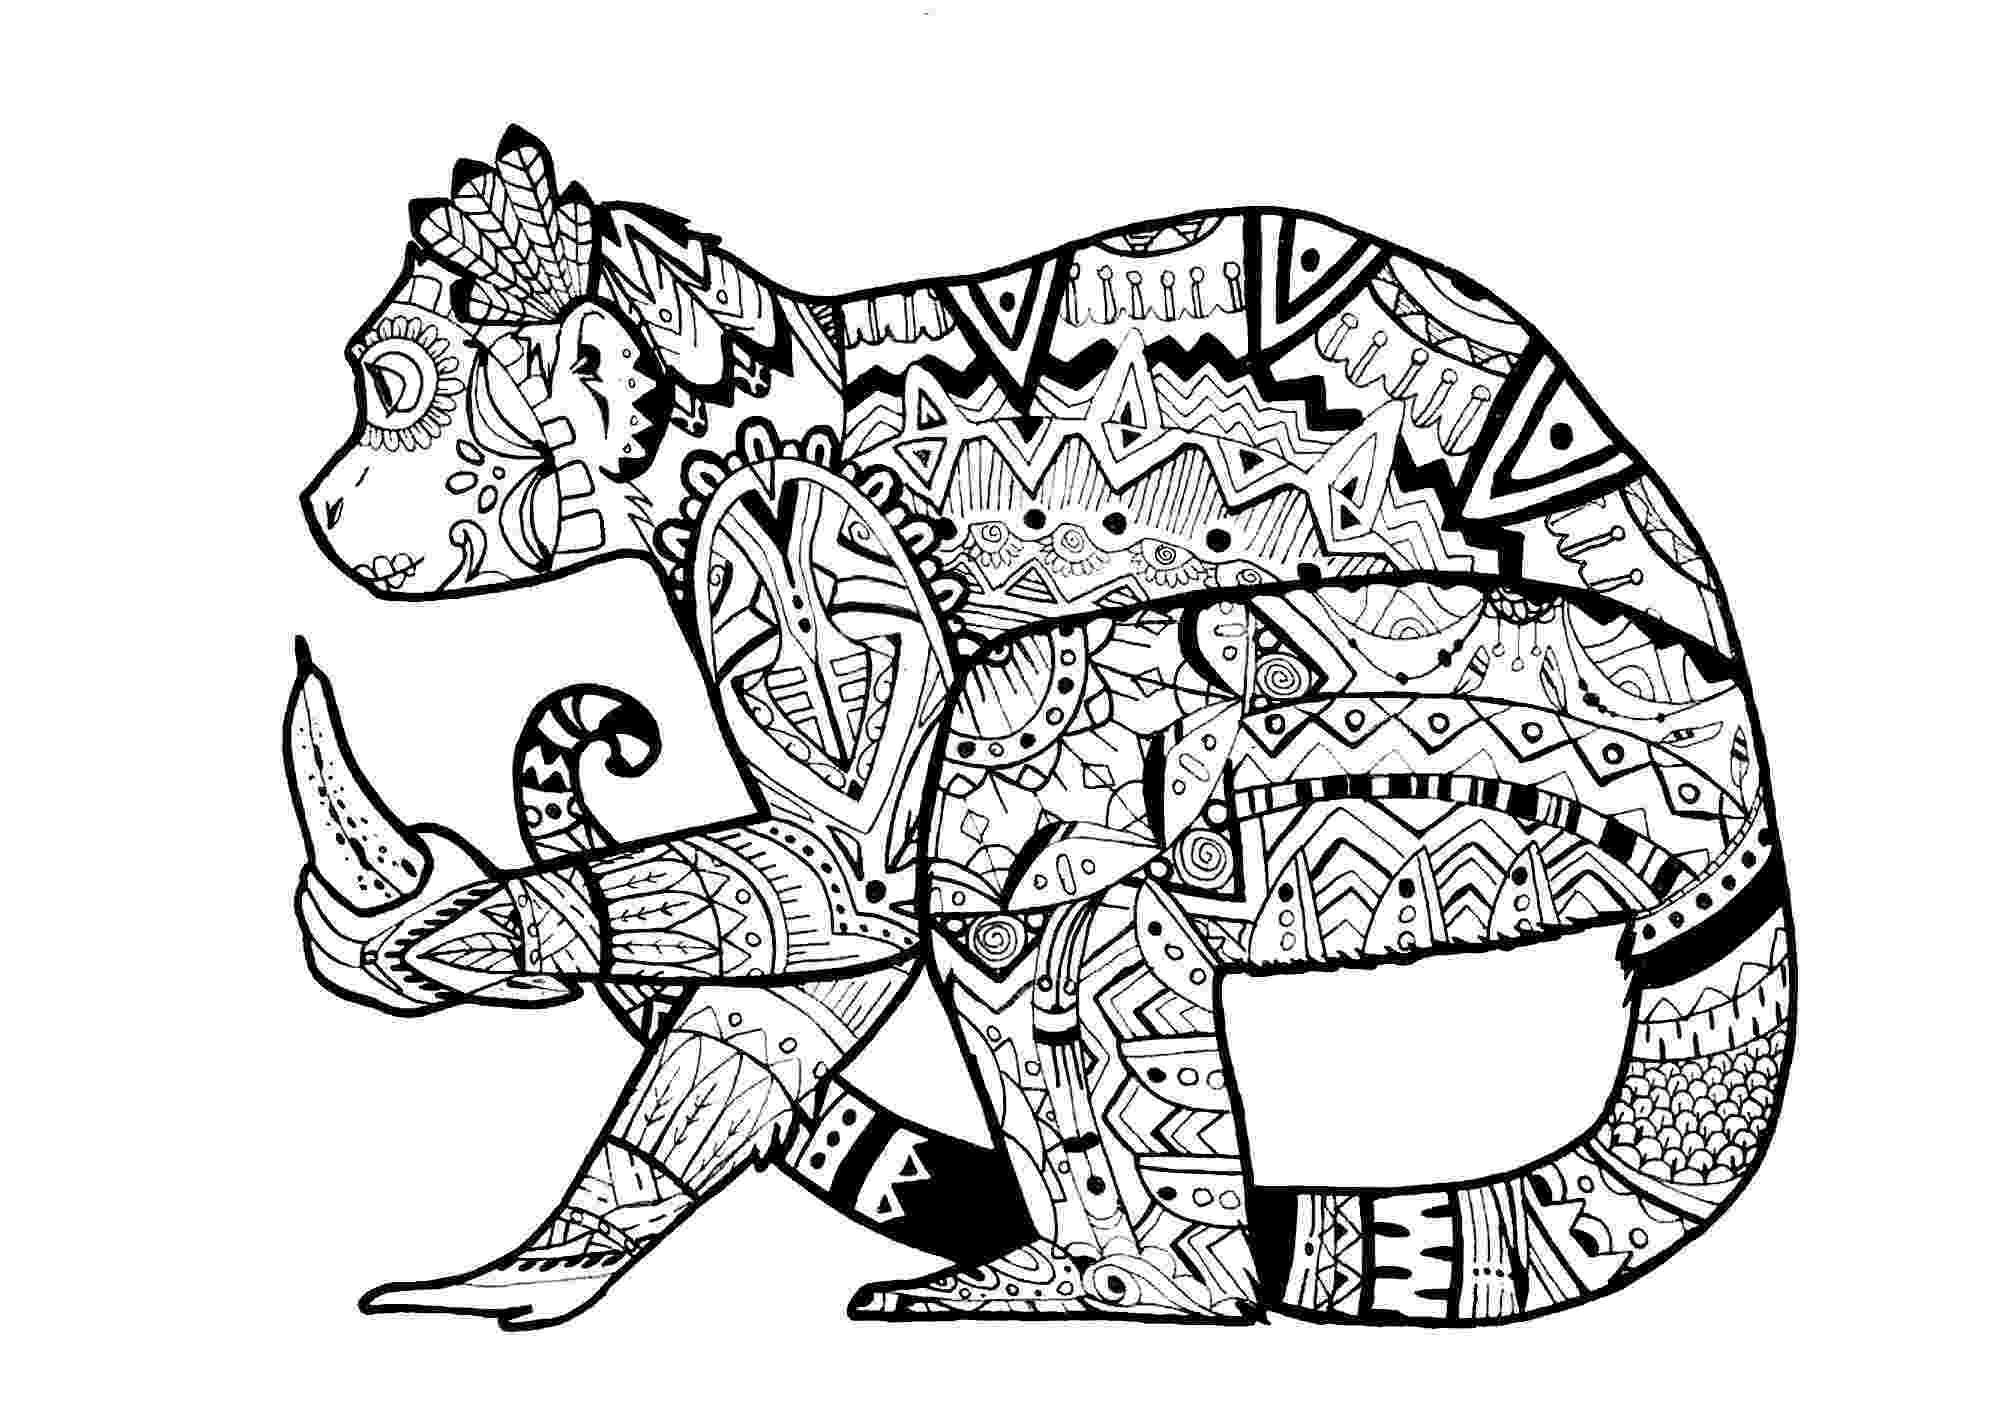 coloring pages mandala animals mandala boyama hayvanlar mandala animals coloring mandala pages